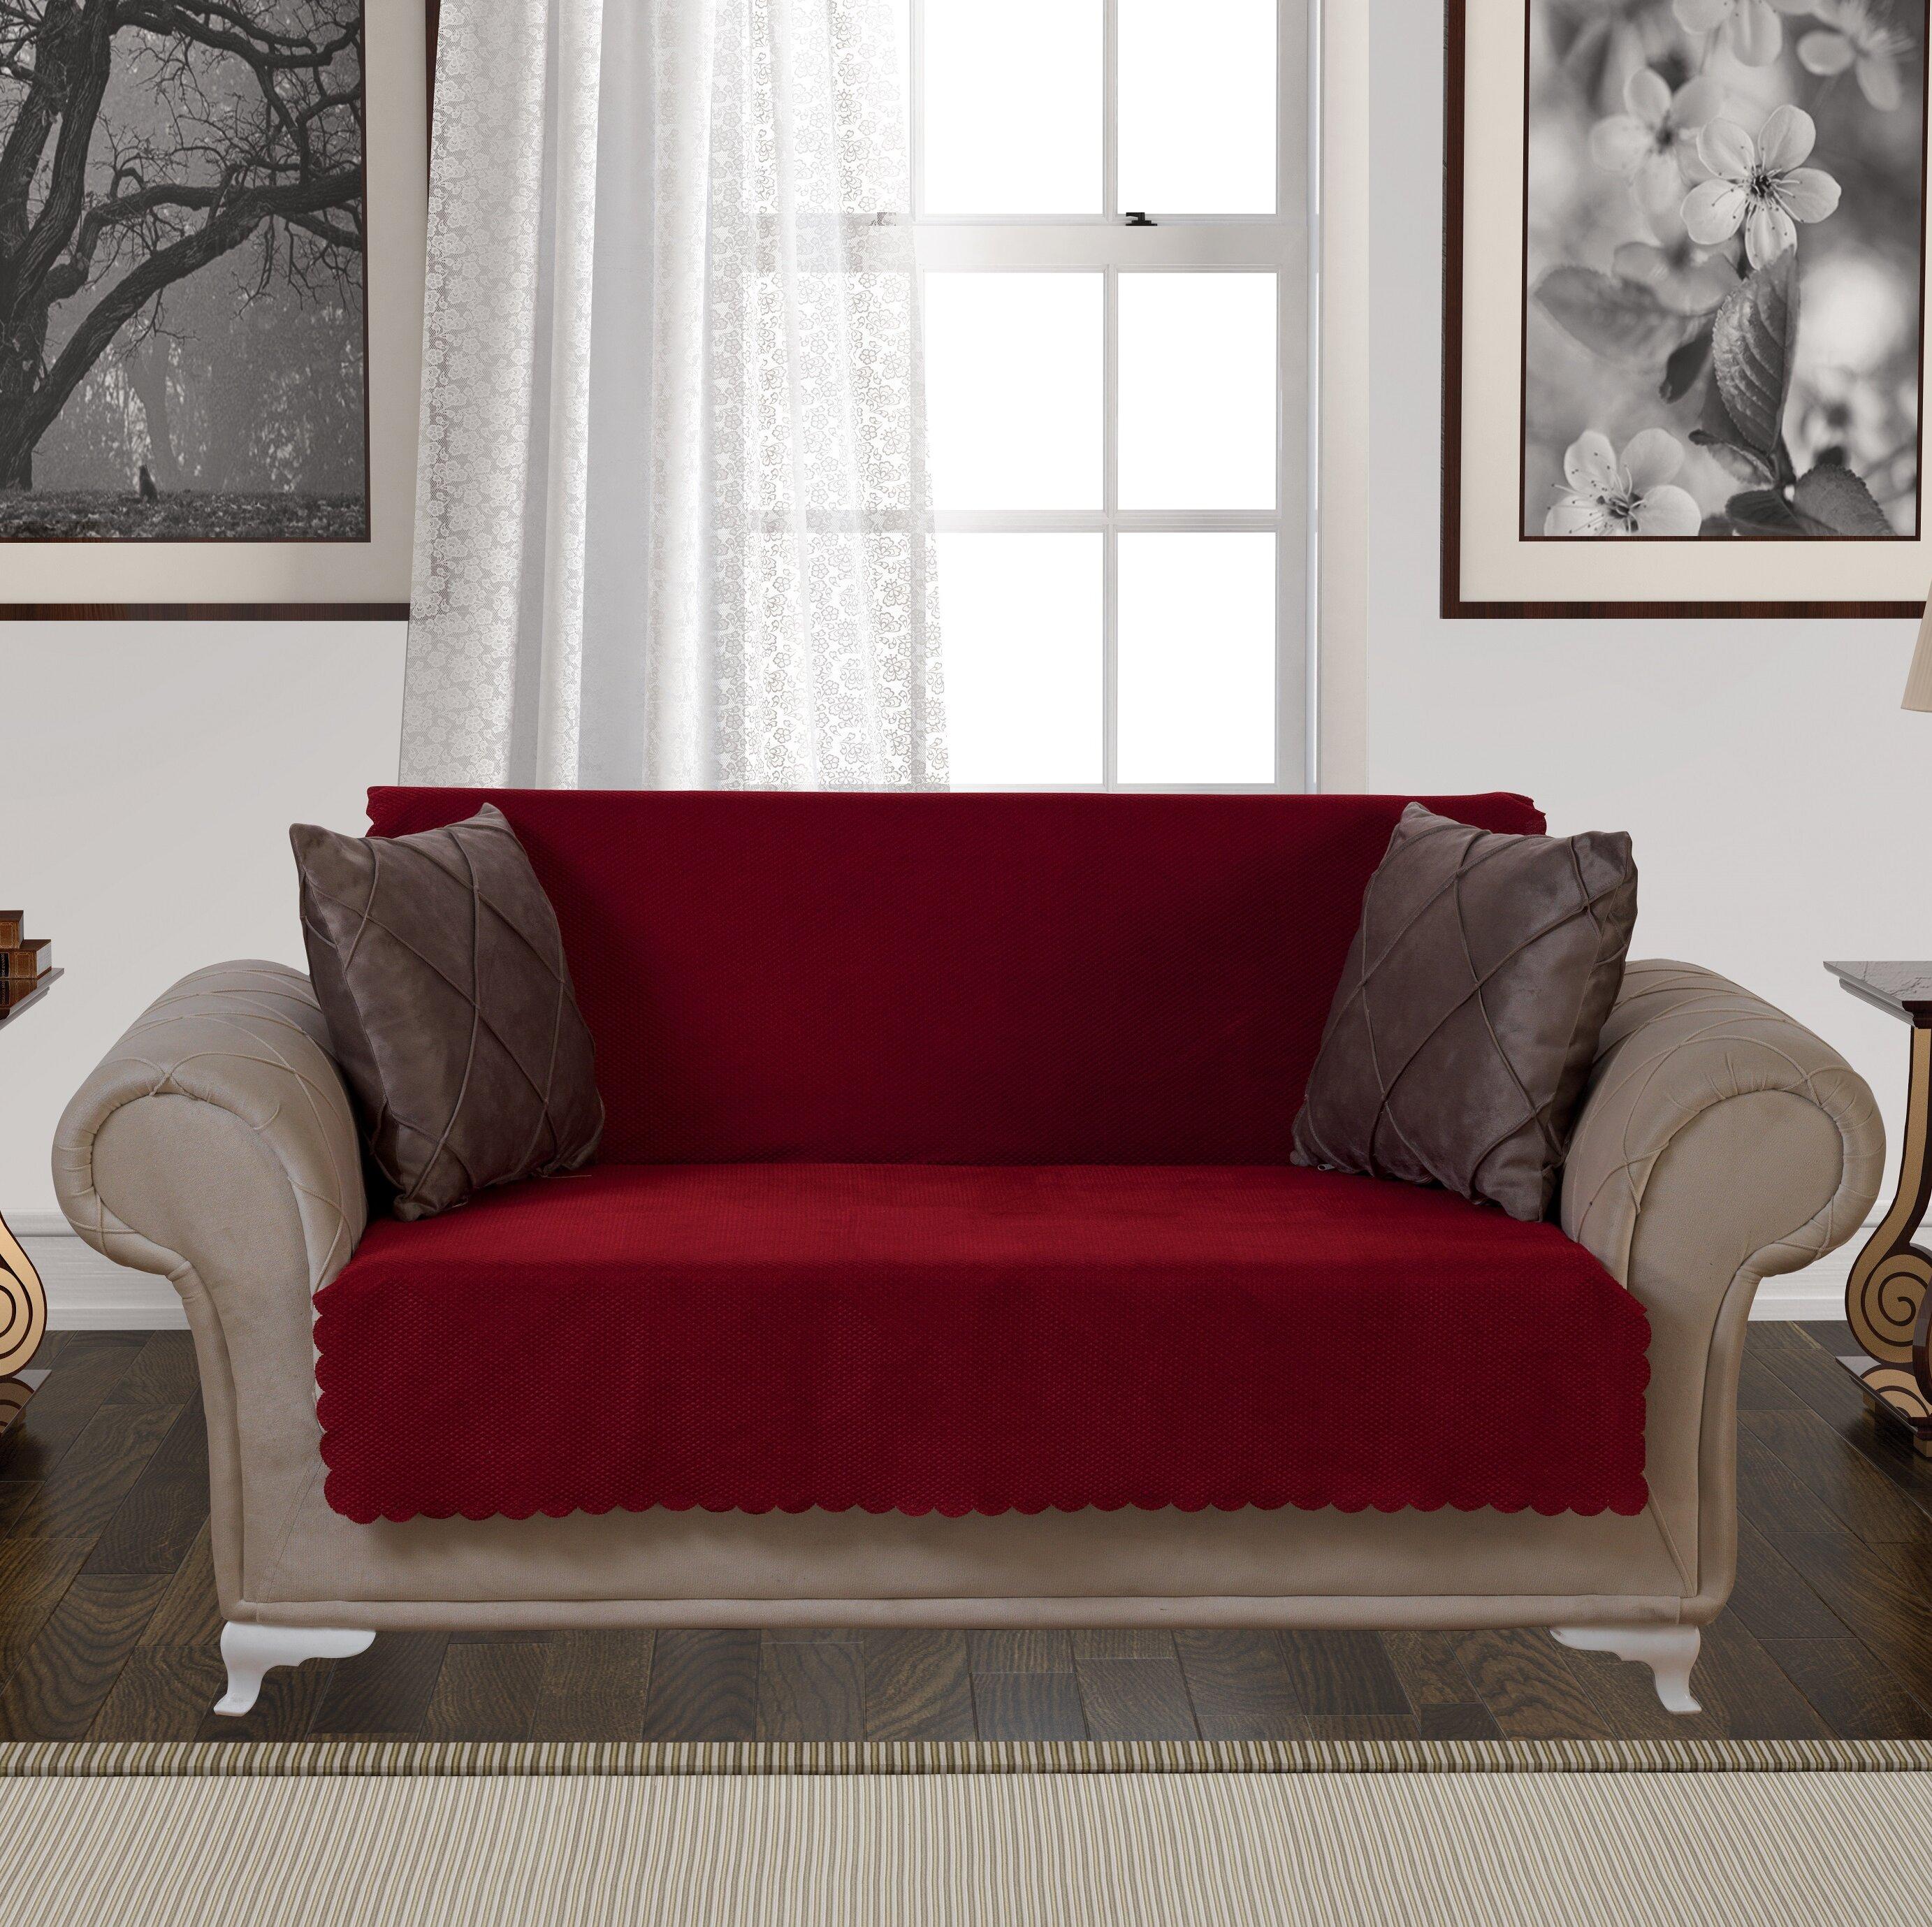 August Grove Diamond Anti-Slip Pet Furniture Protector Box T-Cushion  Loveseat Slipcover   Reviews  55a08090ff17